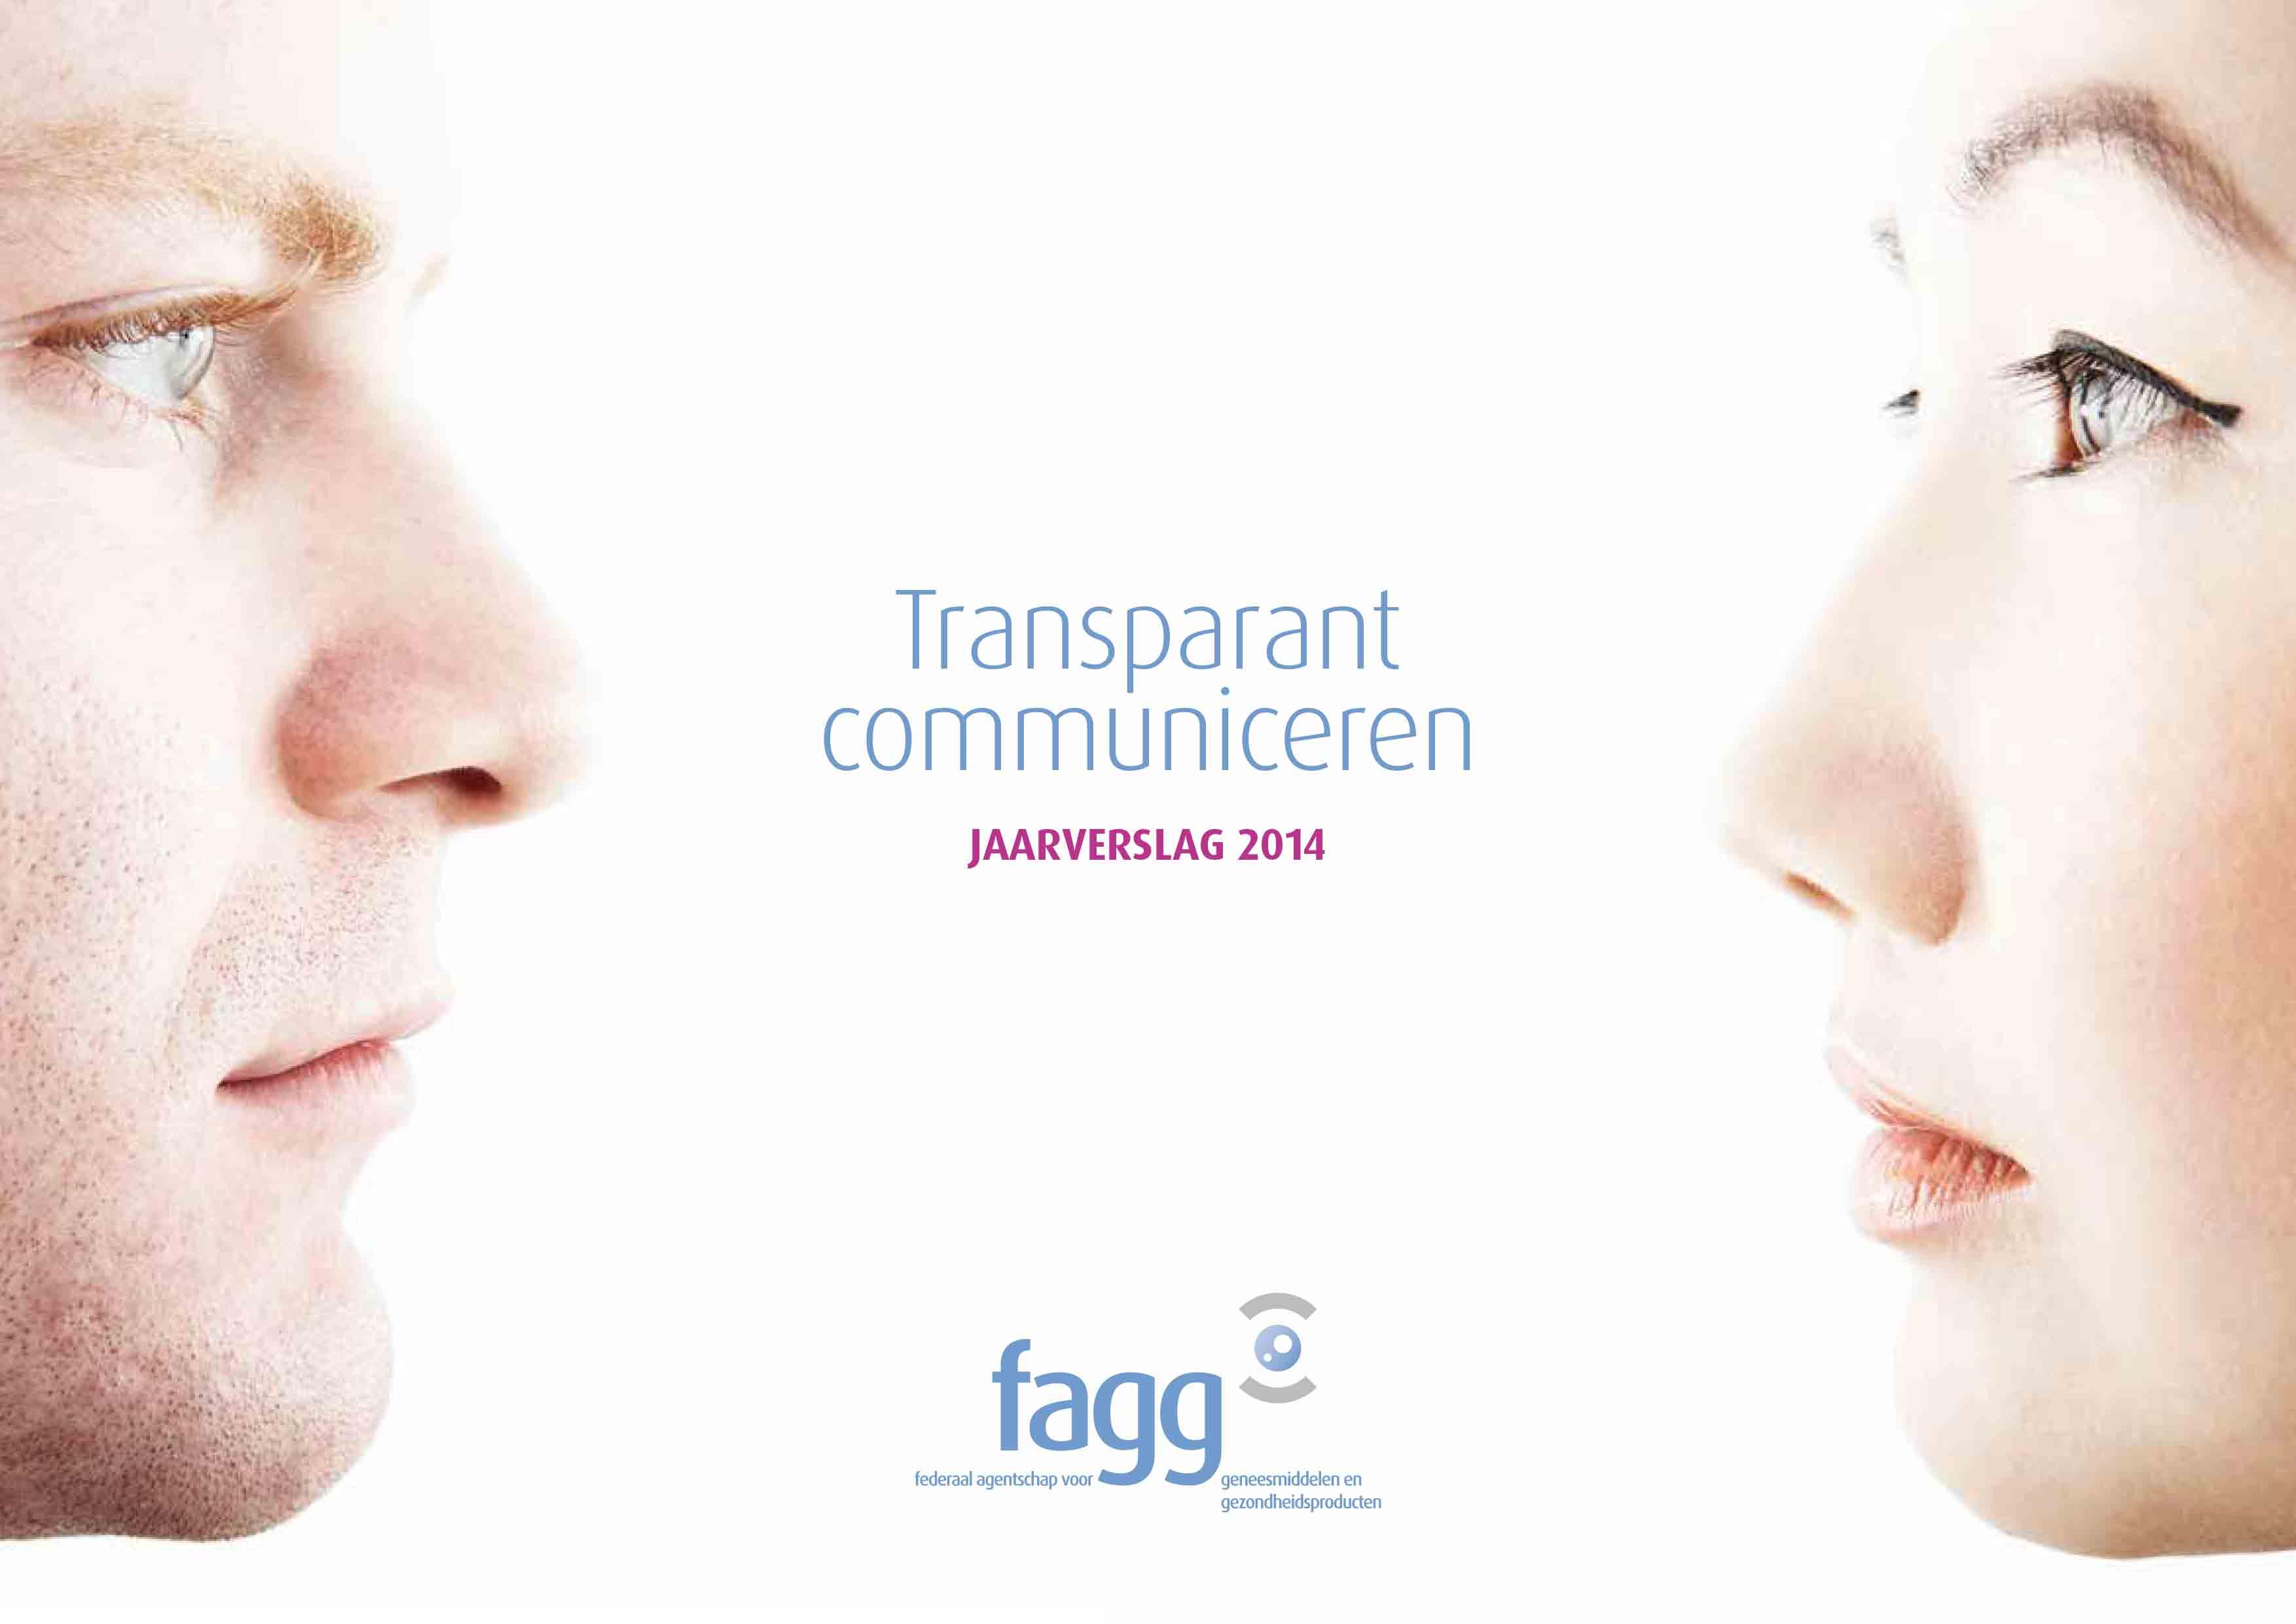 Jaarverslag 2014 cover NL